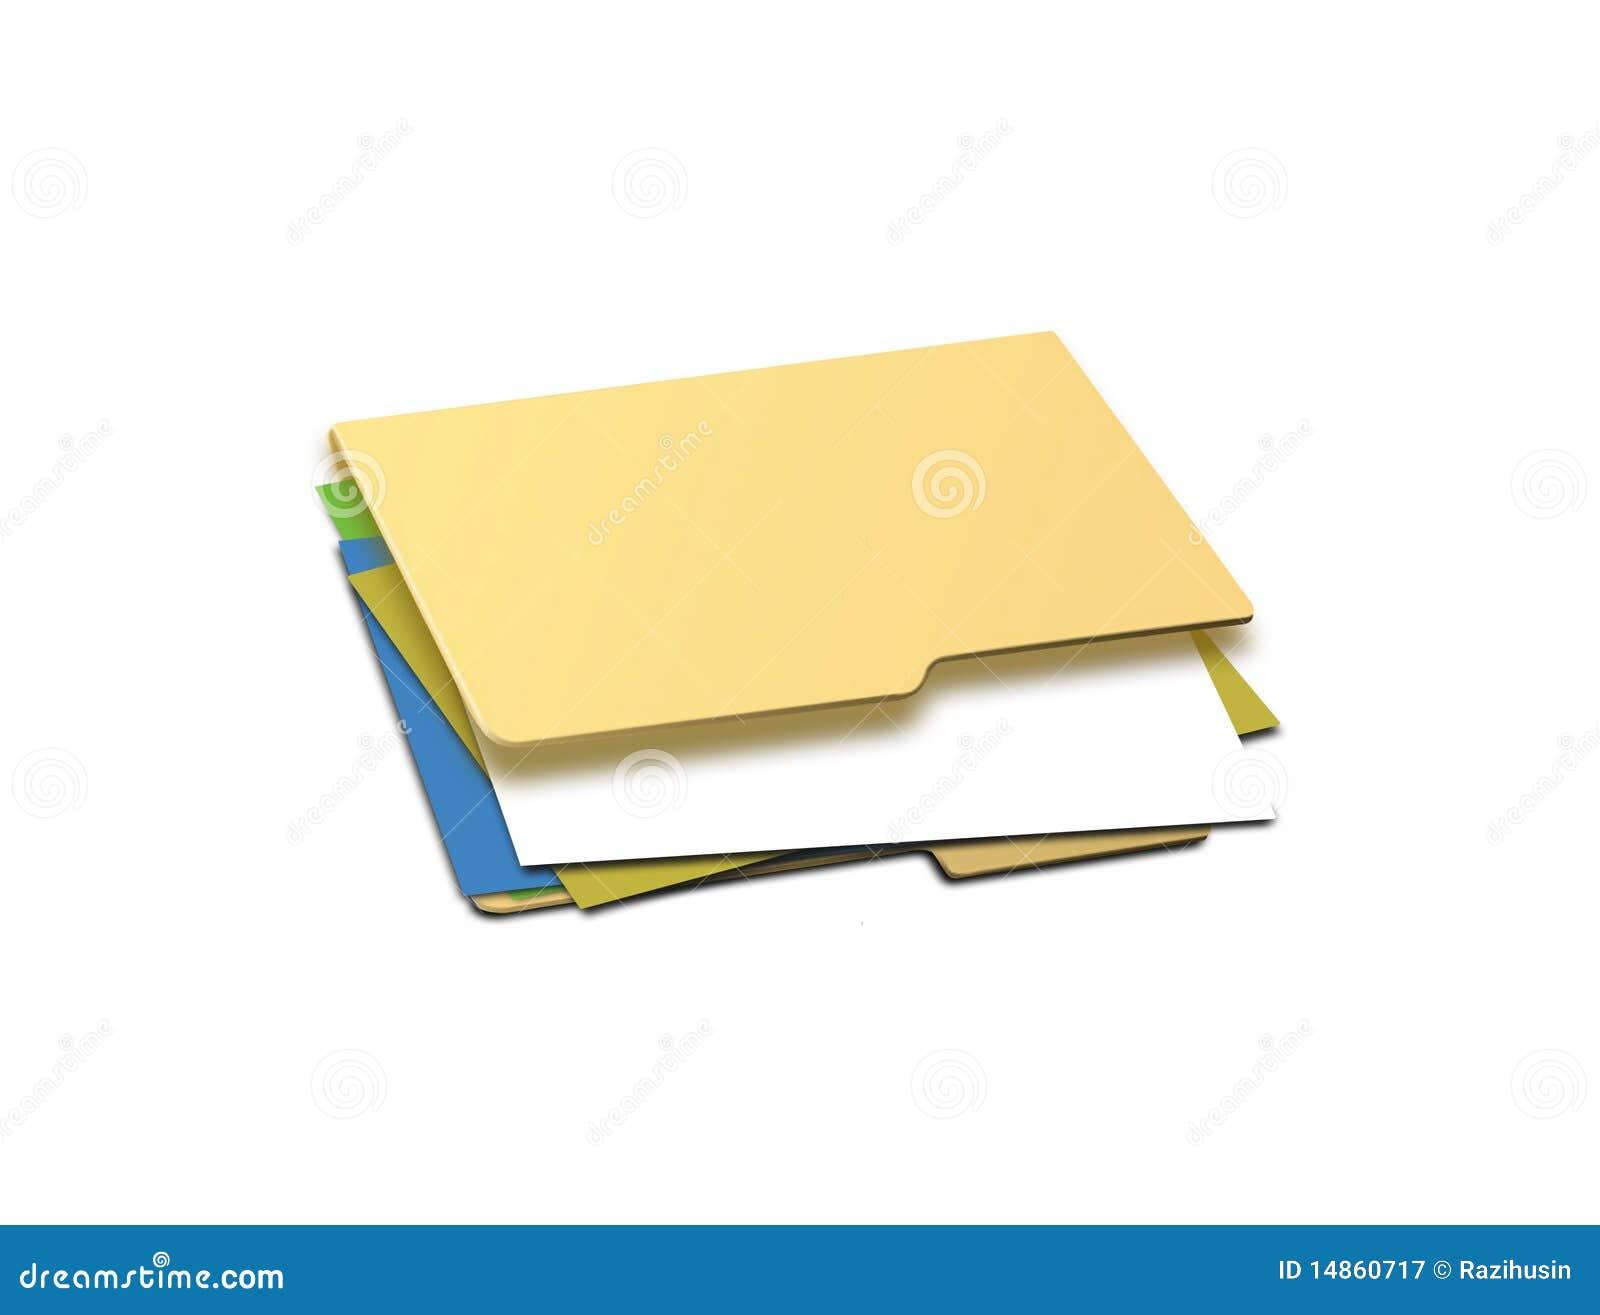 Contract folder